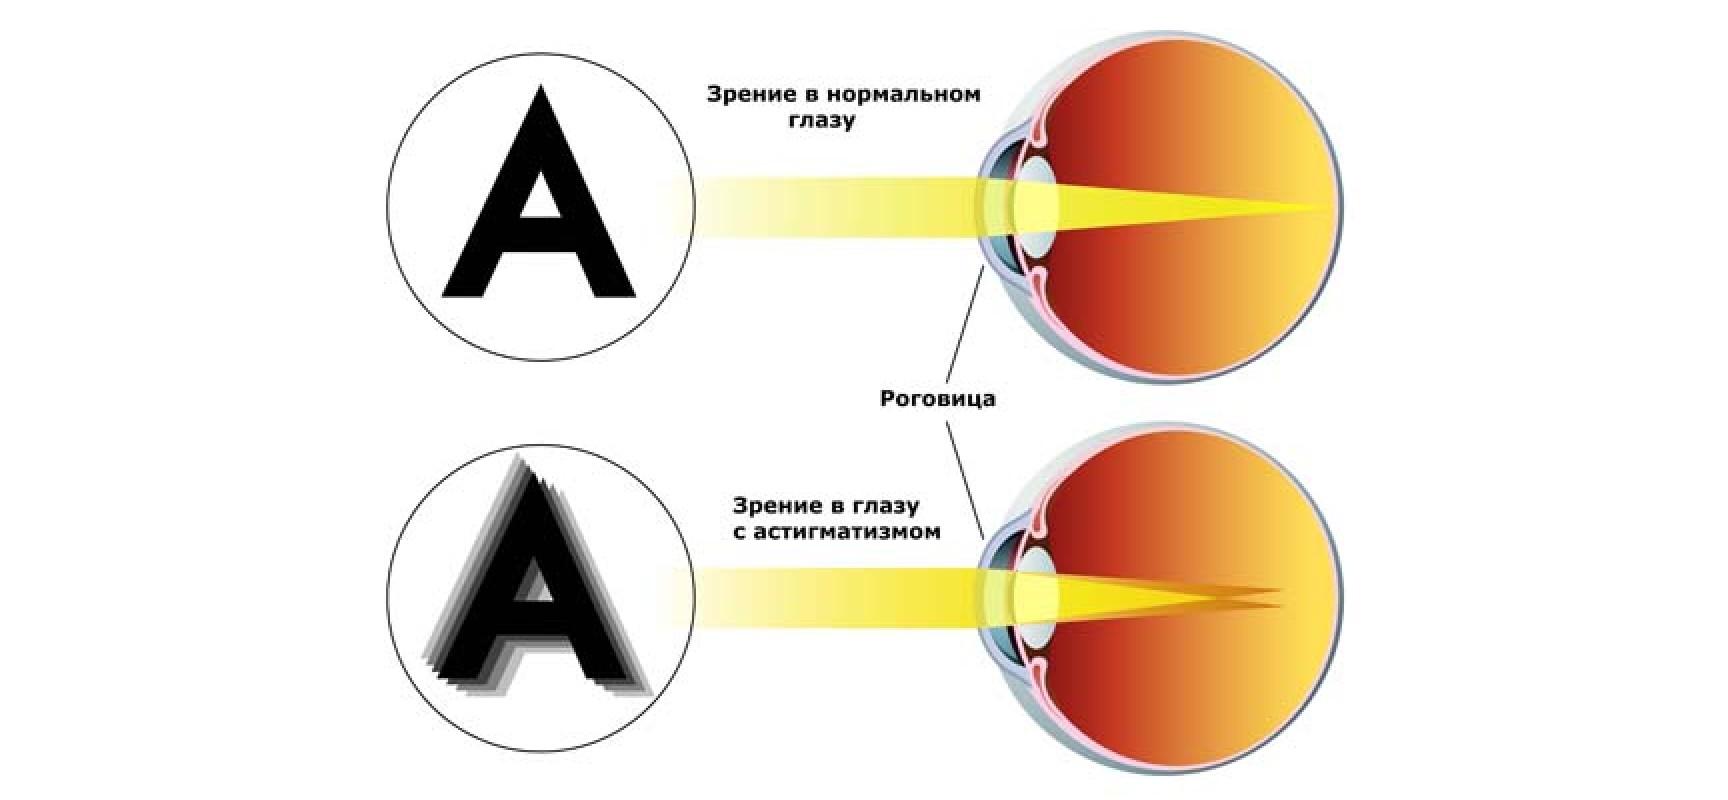 Какие лекарства улучшат зрение